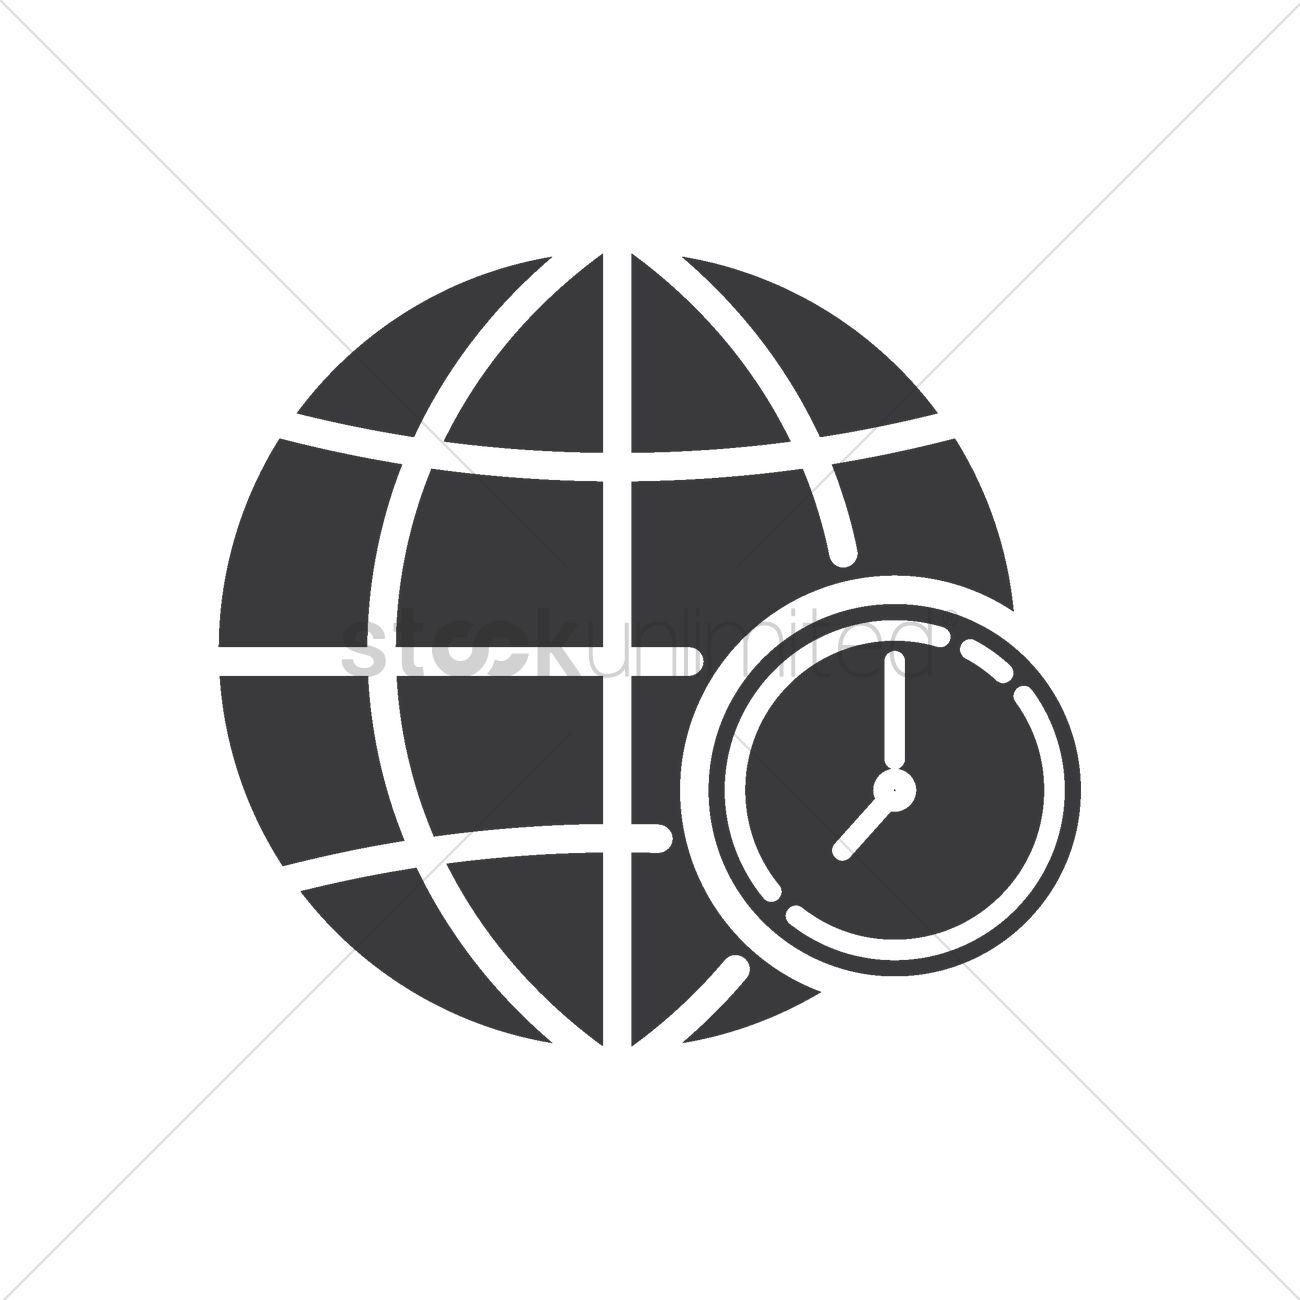 Globe with timezone concept icon Vector Image - 2005020 | StockUnlimited